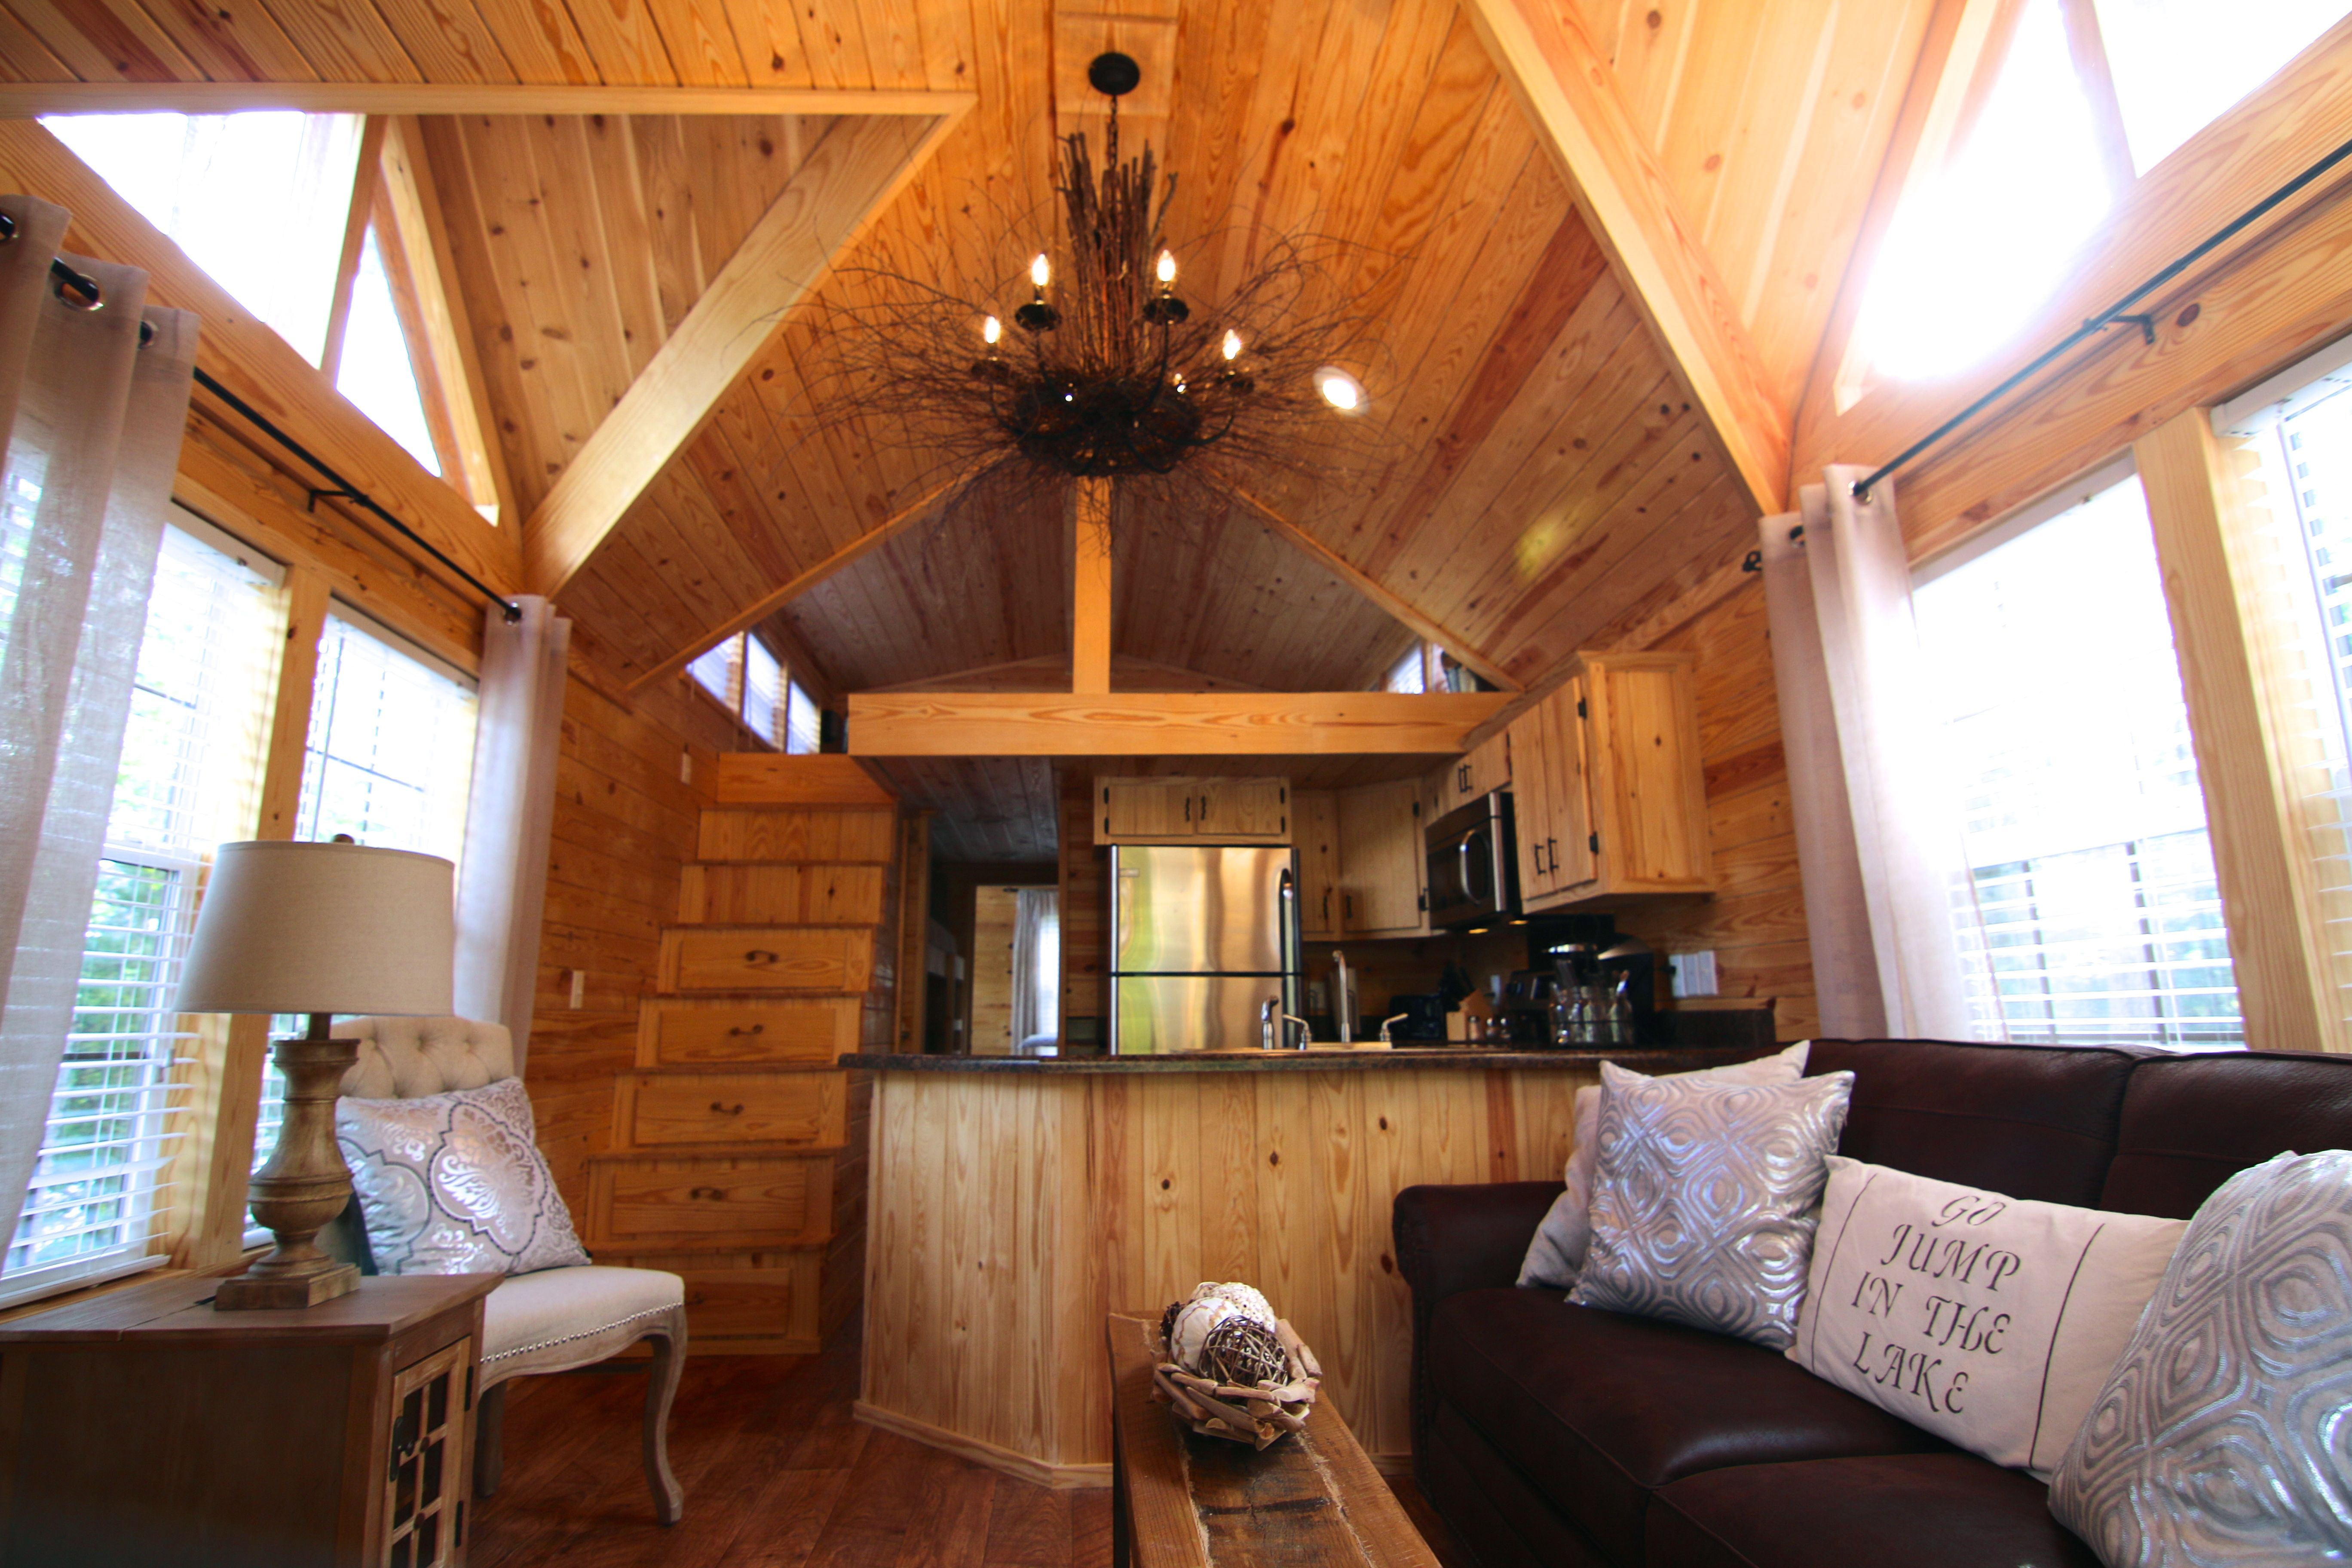 A park model cabin built by Rustic River Park Homes in Hamilton, AL ...